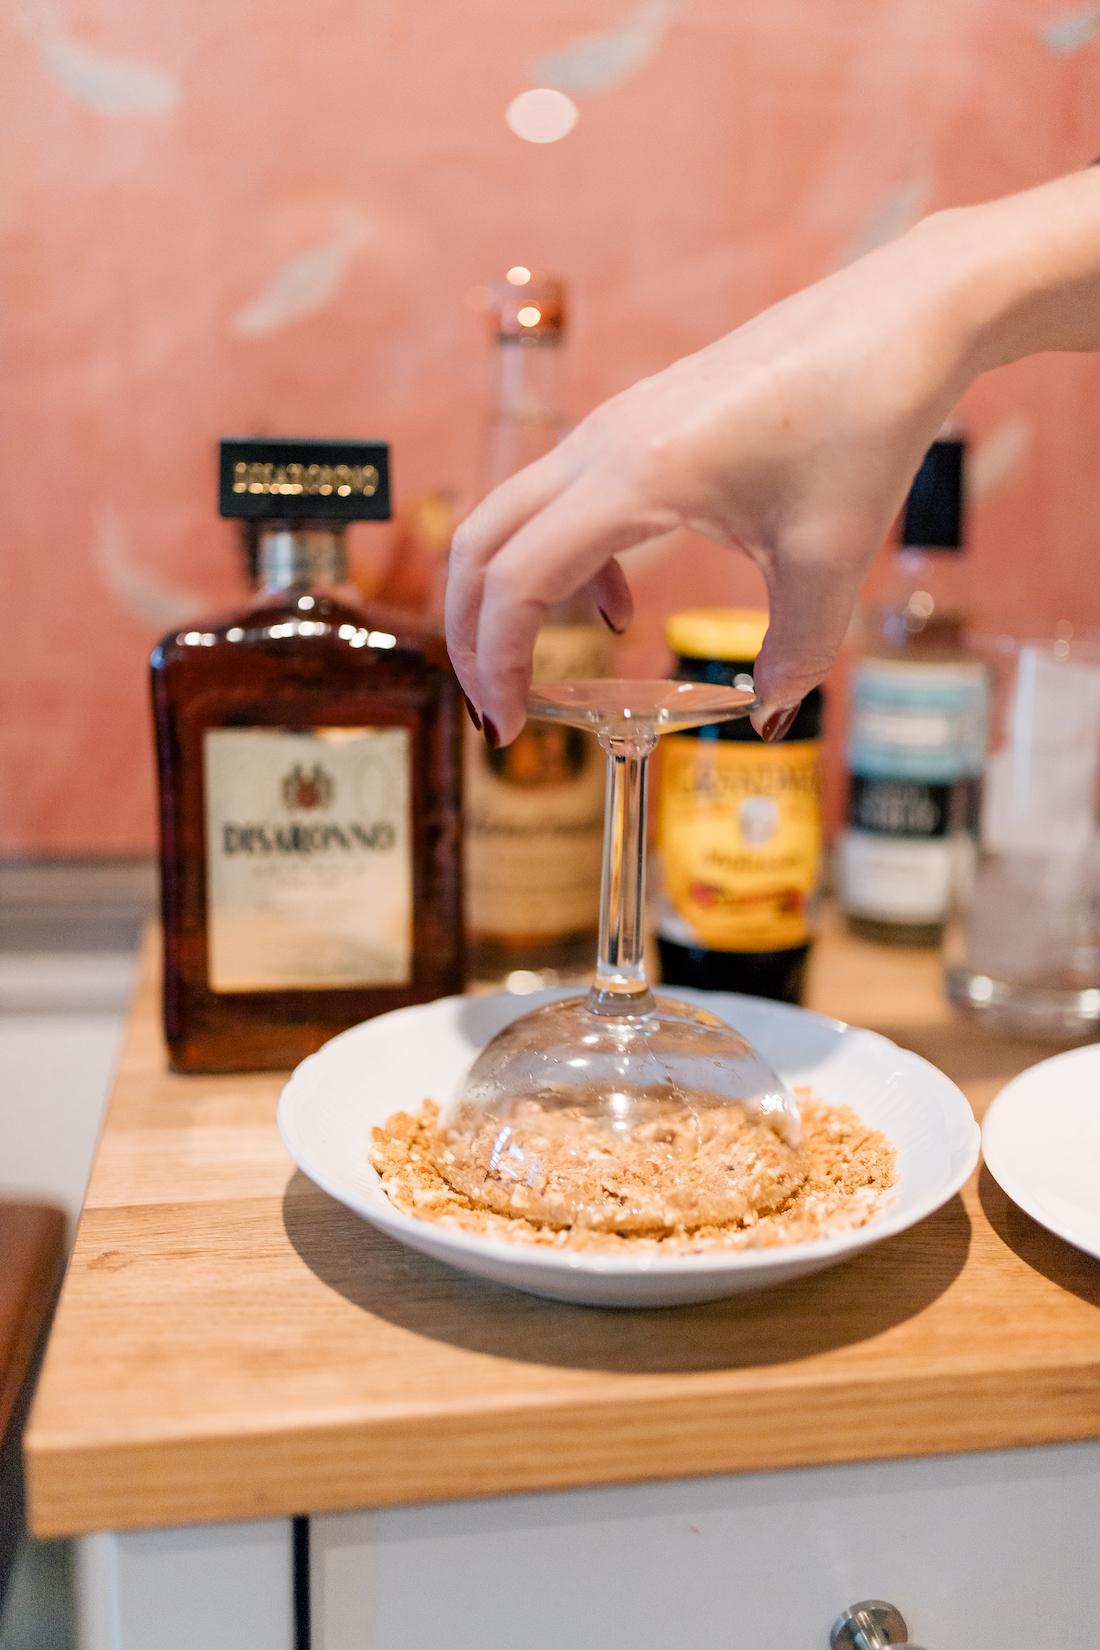 Christmas Martini Recipe - Step 1: Make the Graham Cracker Rim